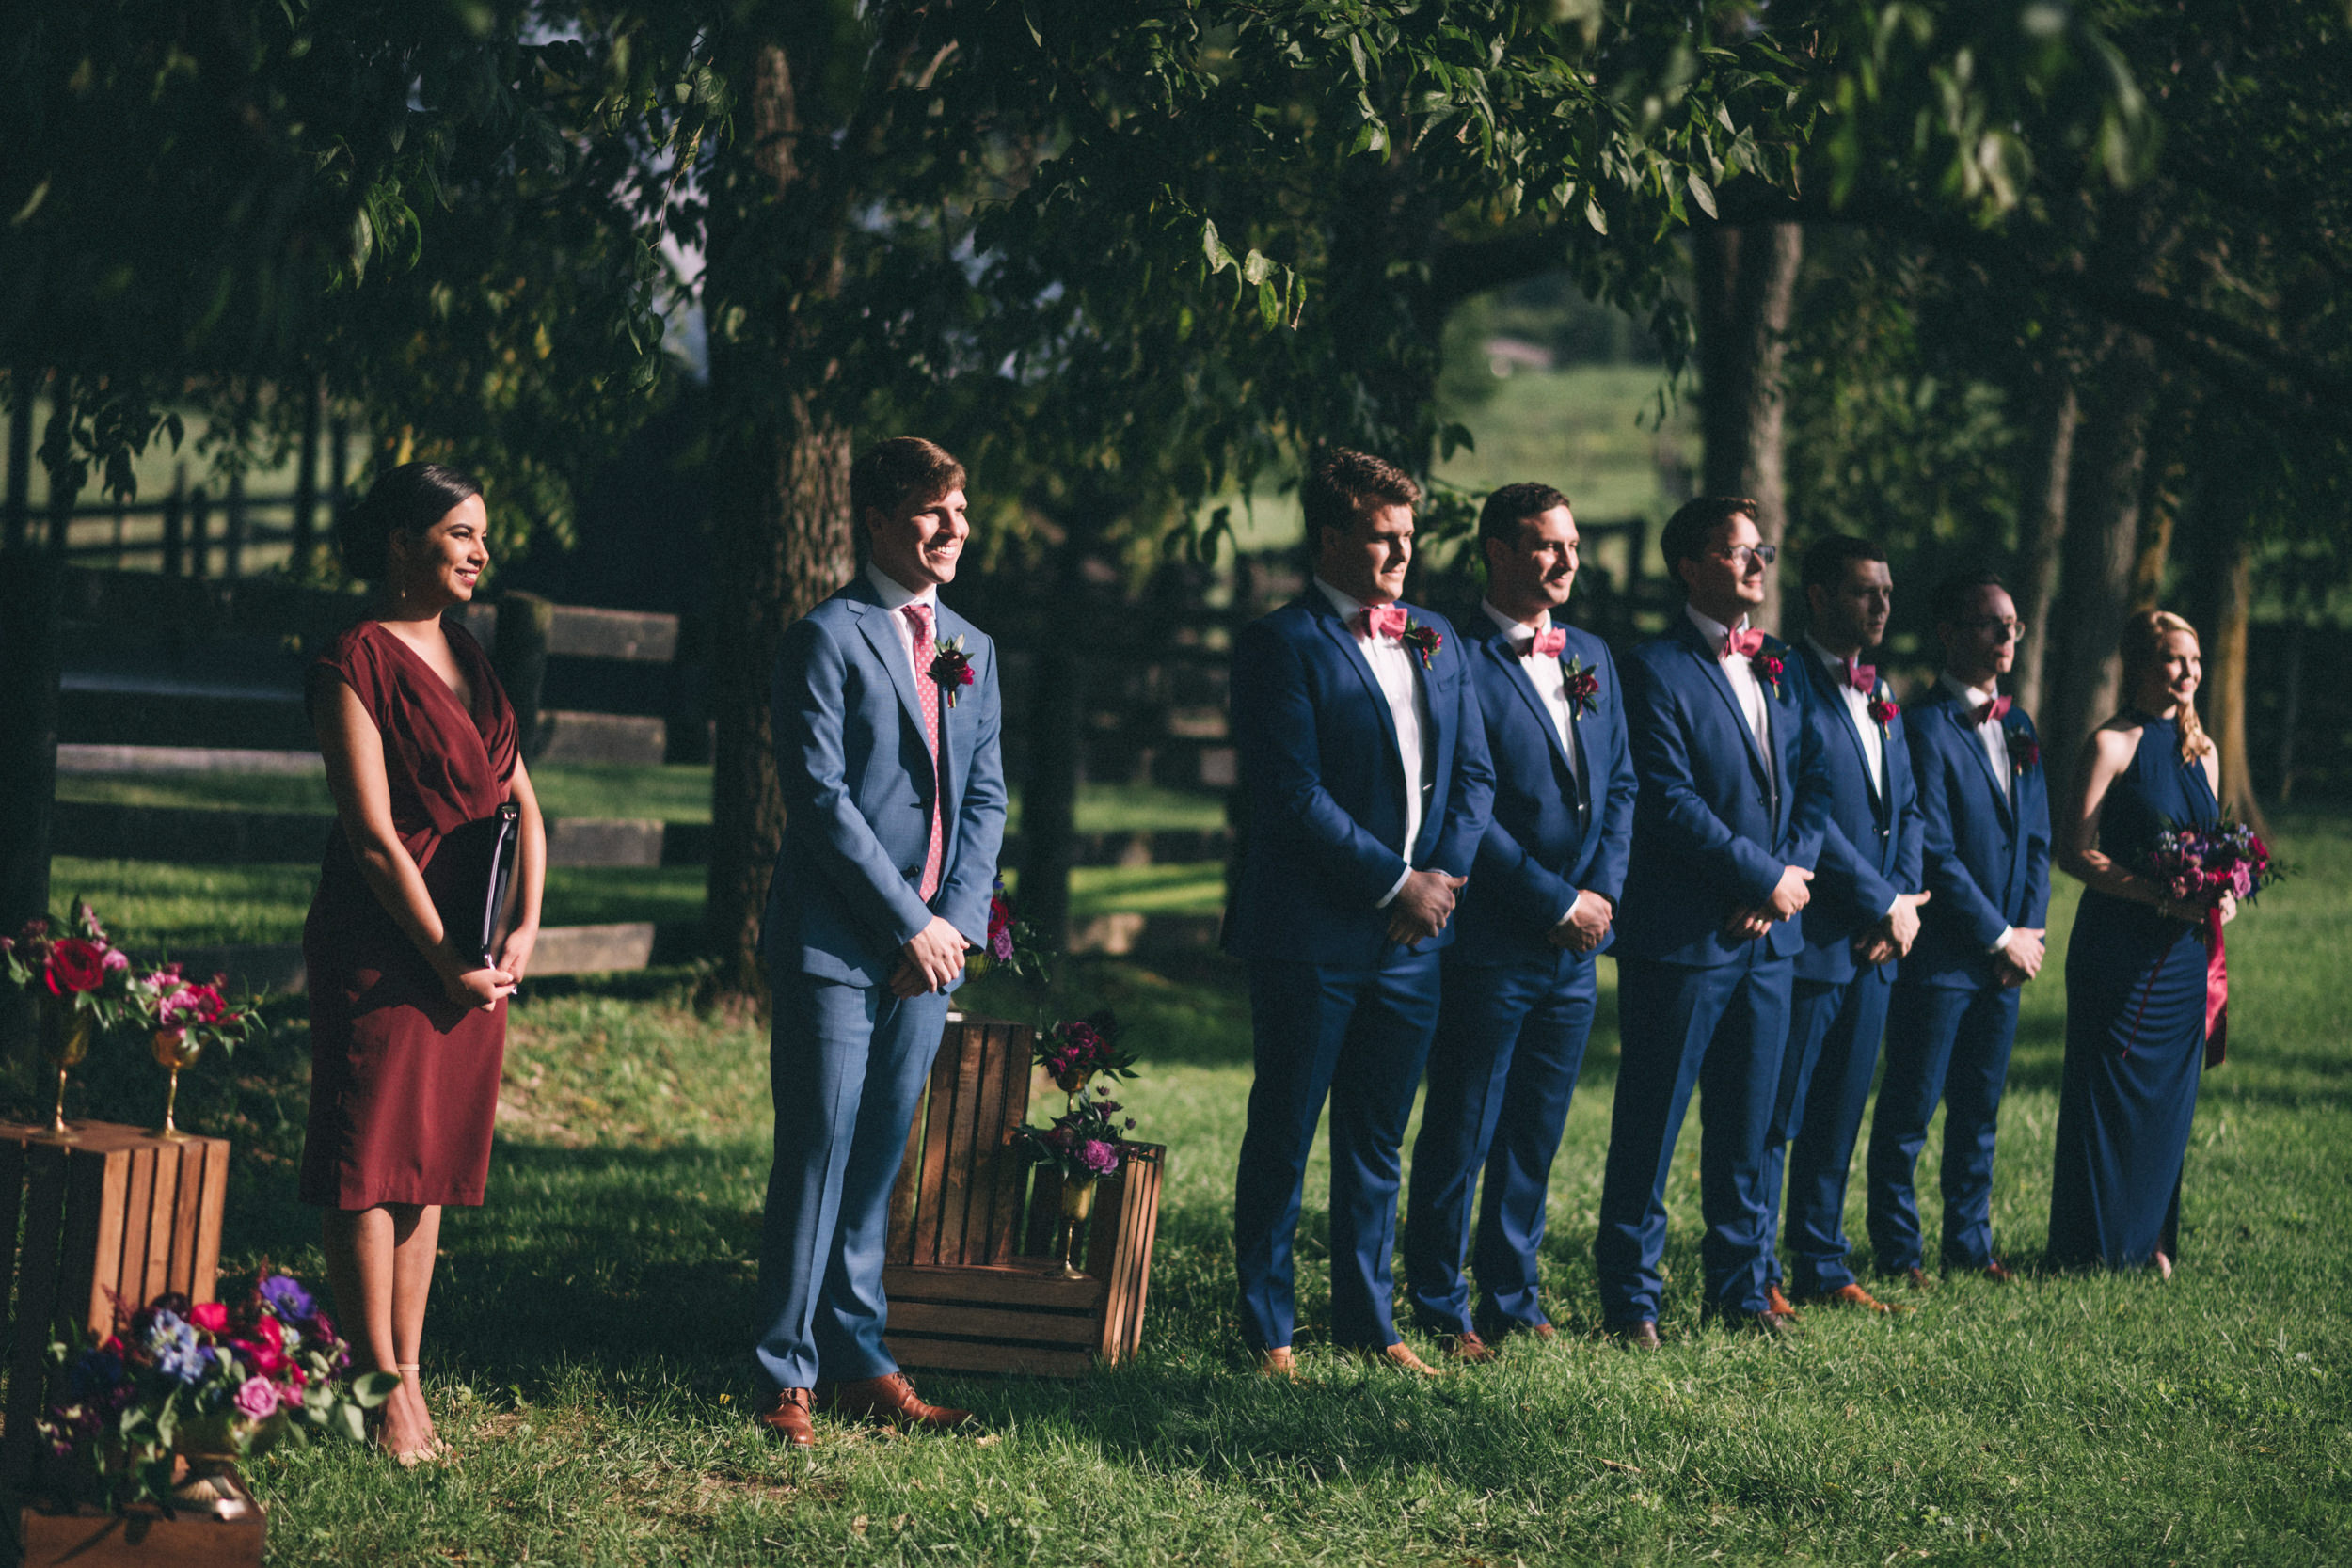 Louisville-Kentucky-Wedding-and-Elopement-Photographer-Sarah-Katherine-Davis-Photography-Summer-Jewel-Toned-Wedding-Chineese-Tea-Ceremony-Warrenwood-Manor-Danville-494.jpg